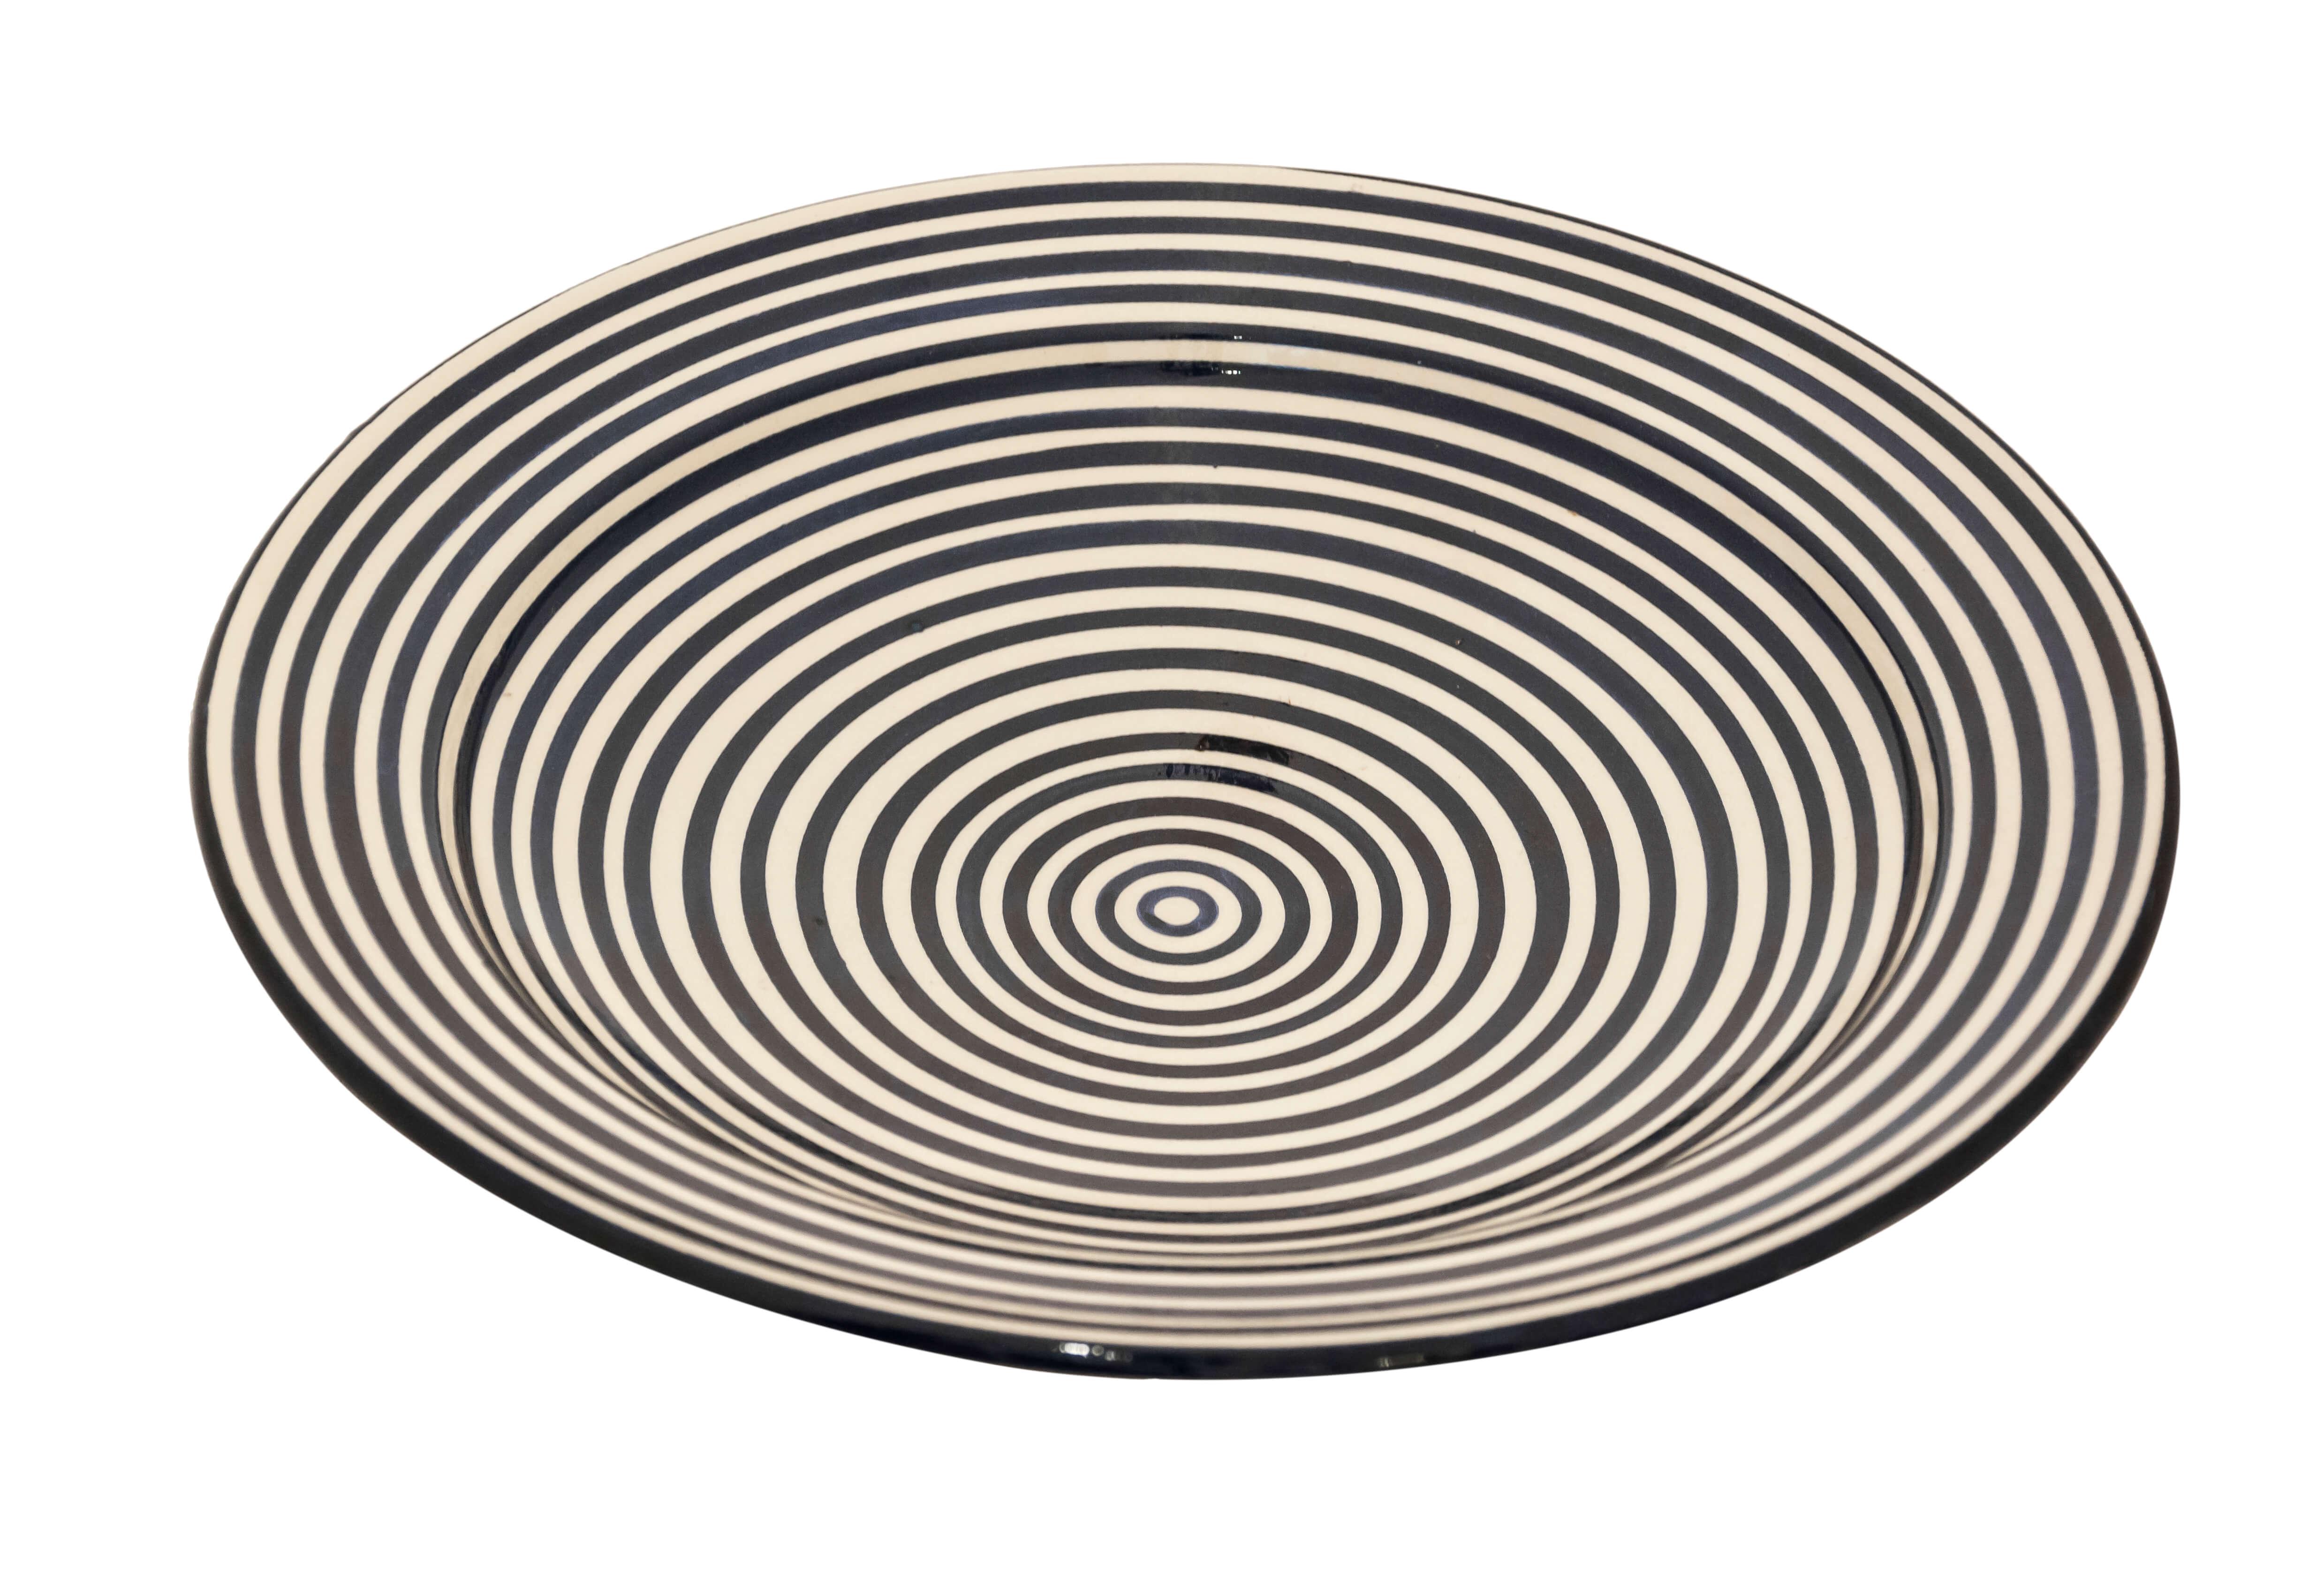 Moroccan black spiral plate, 27 Cm